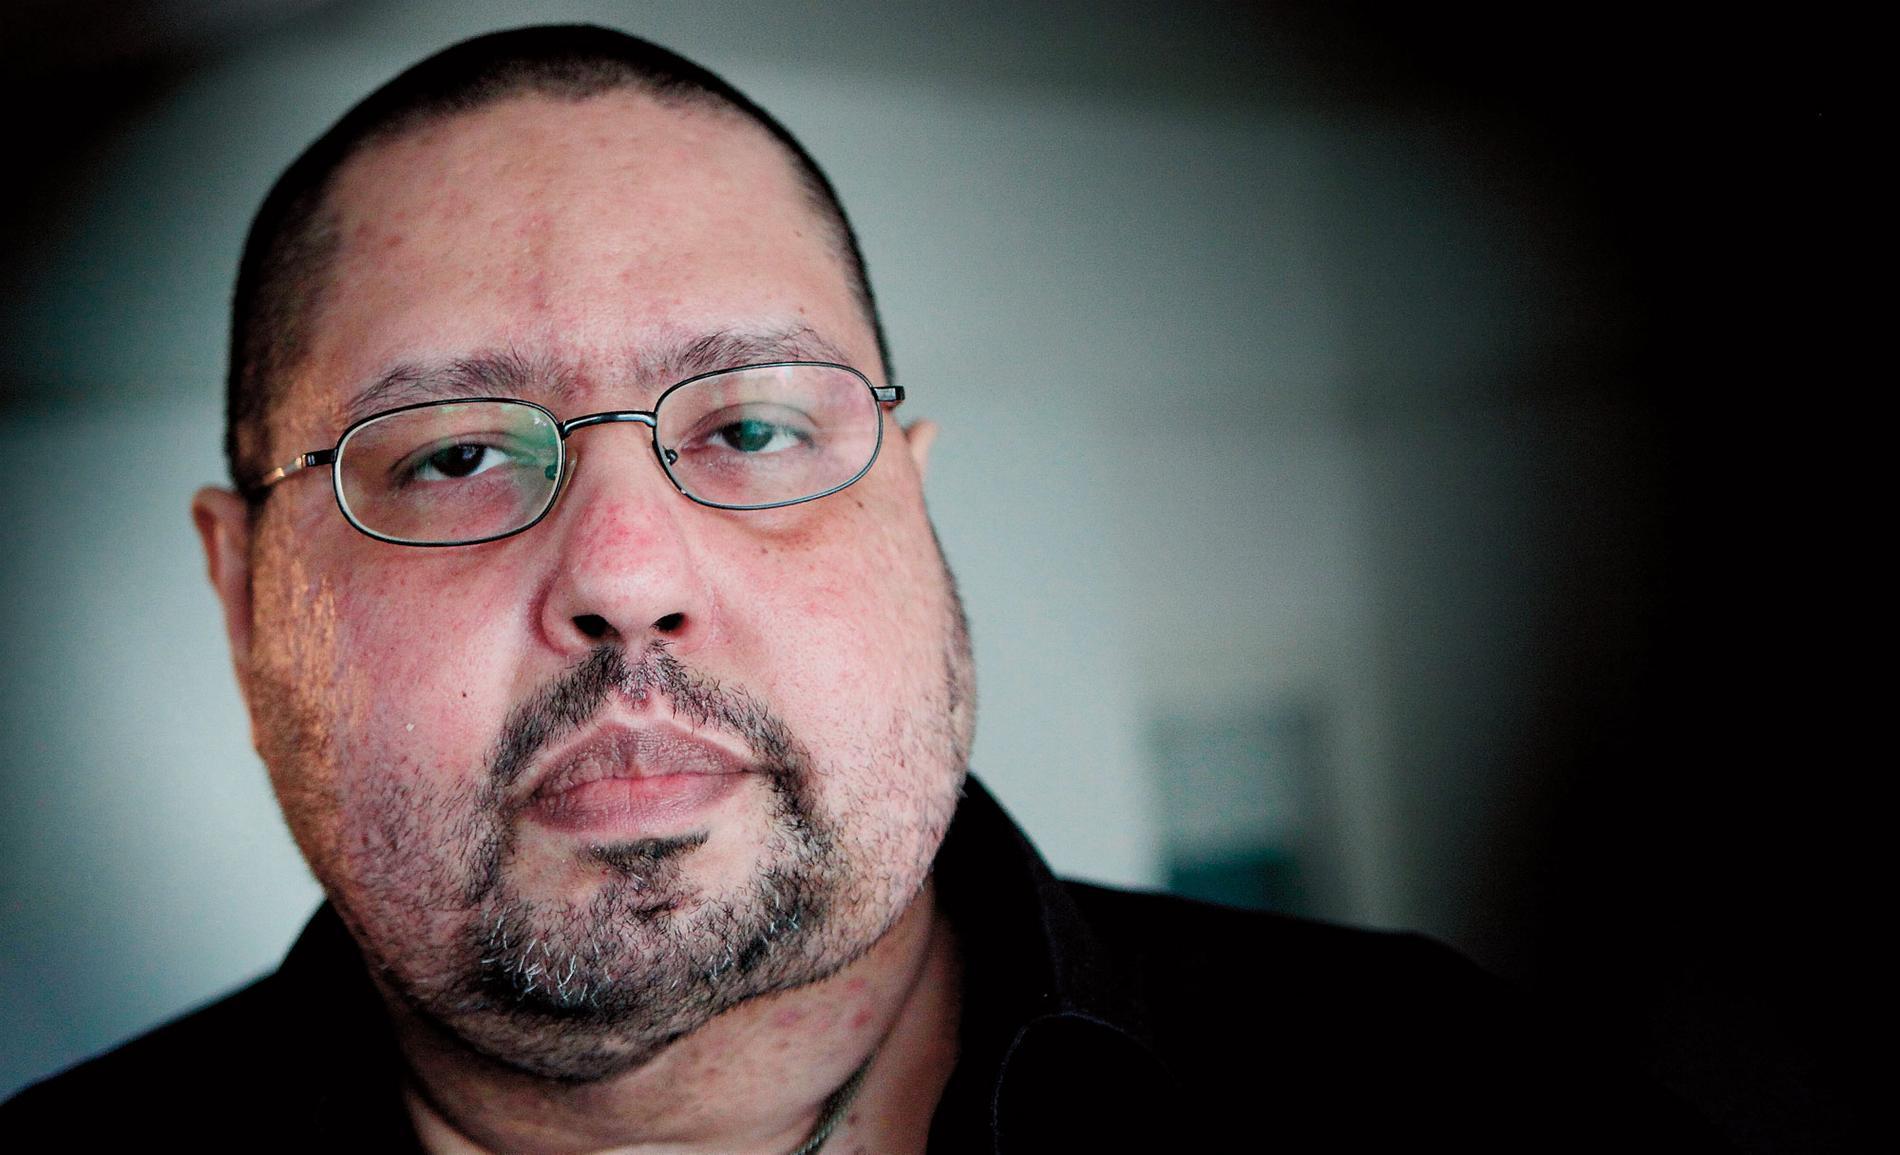 Heberson Vieira da Costa blev 1991 skjuten av lasermannen John Ausonius.